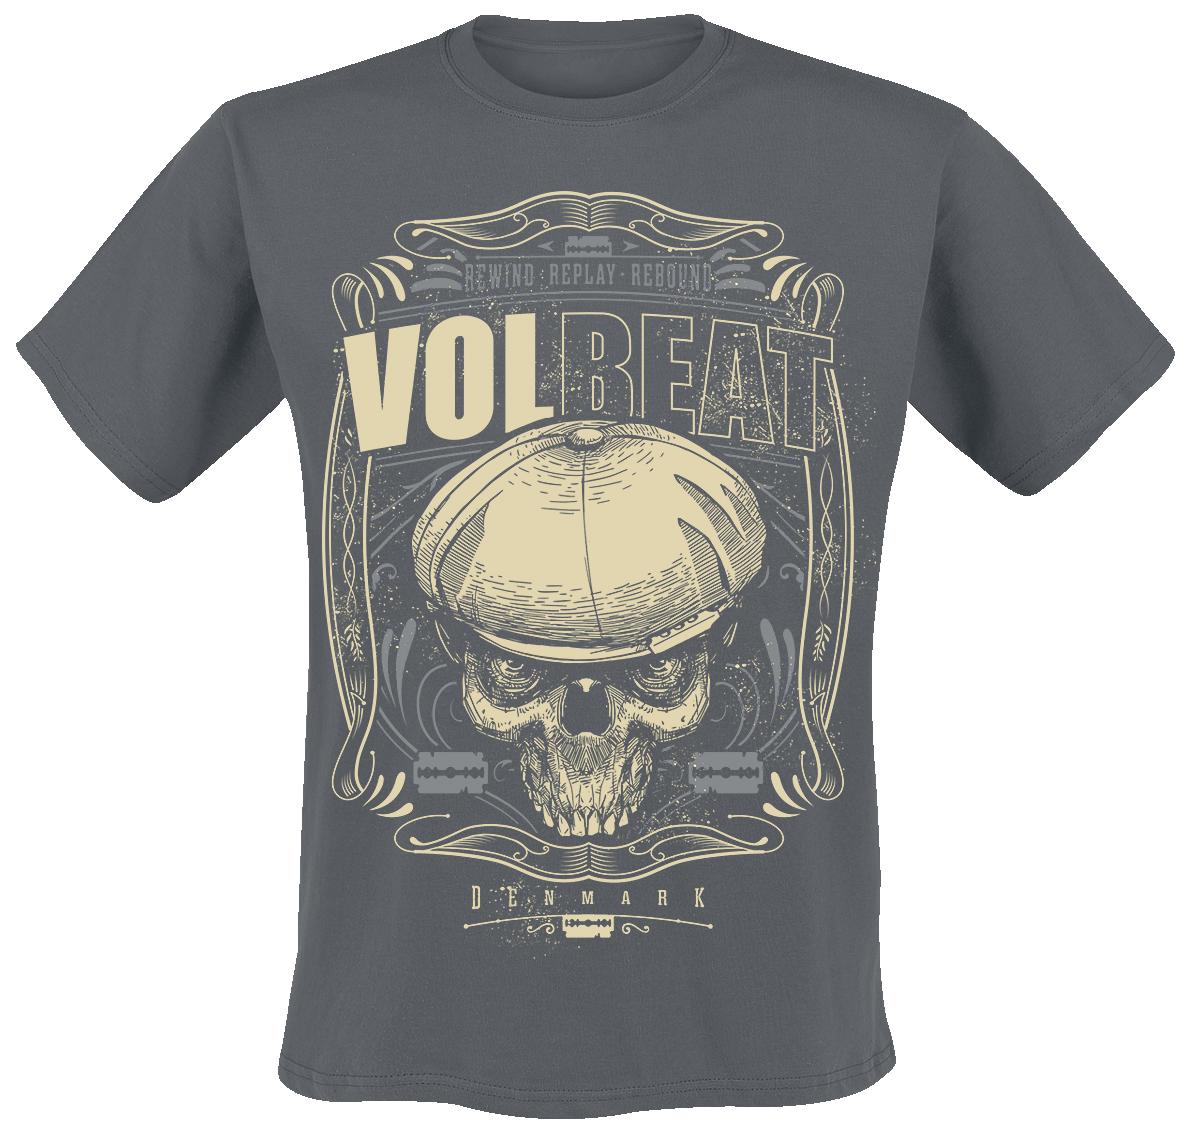 Volbeat - Skull Ornaments - T-Shirt - charcoal image